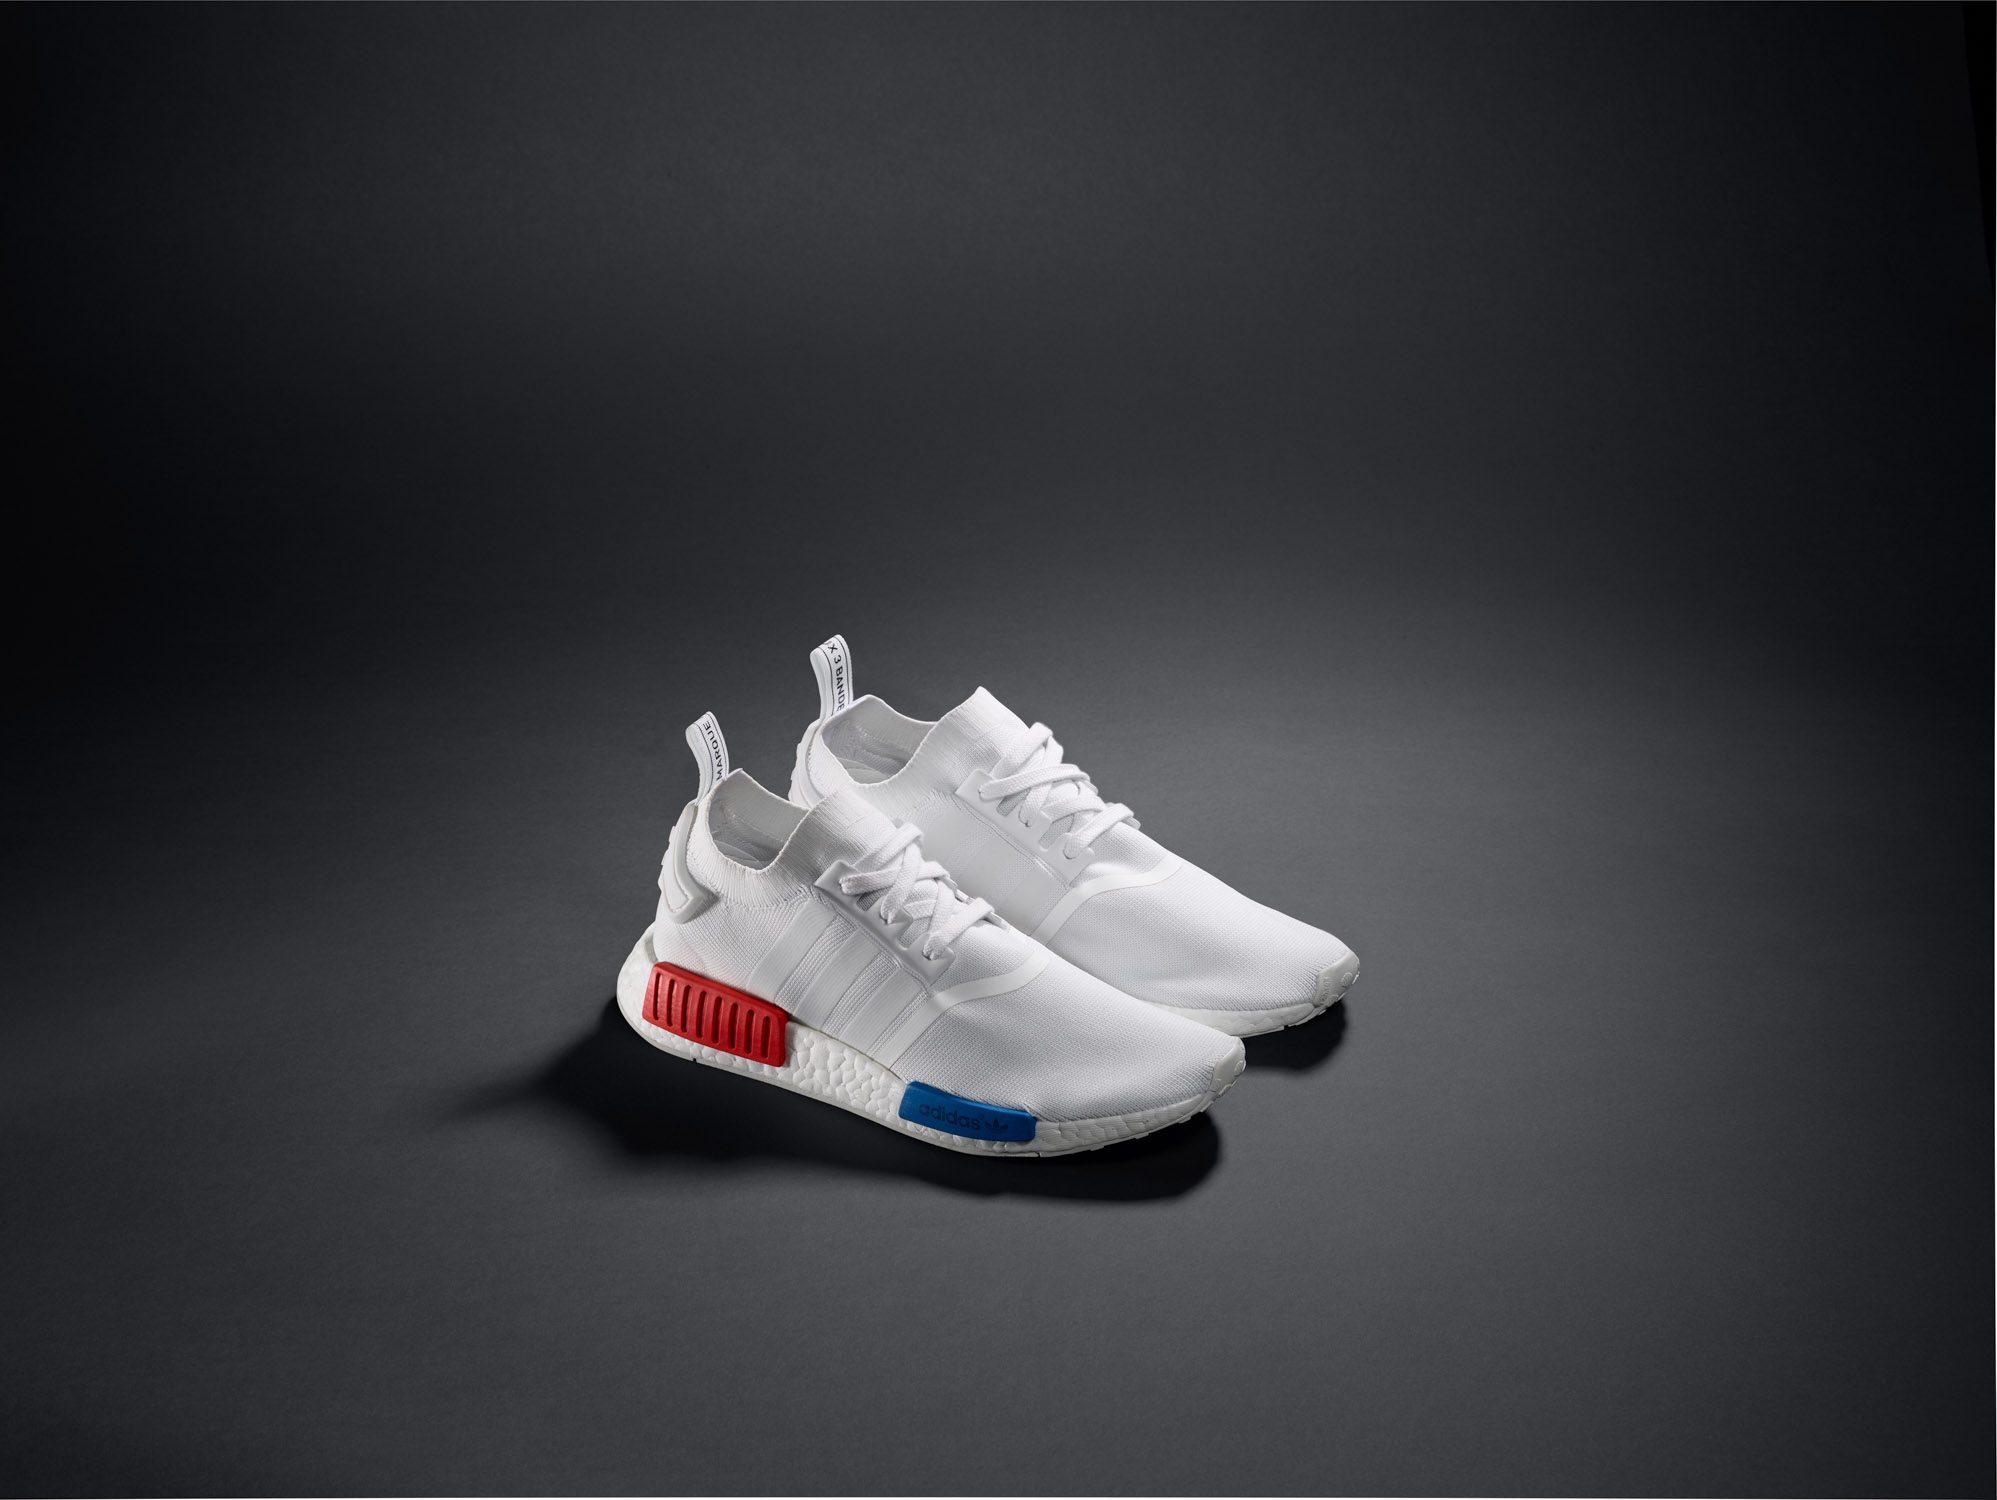 adidas NMD Primeknit White OG 8